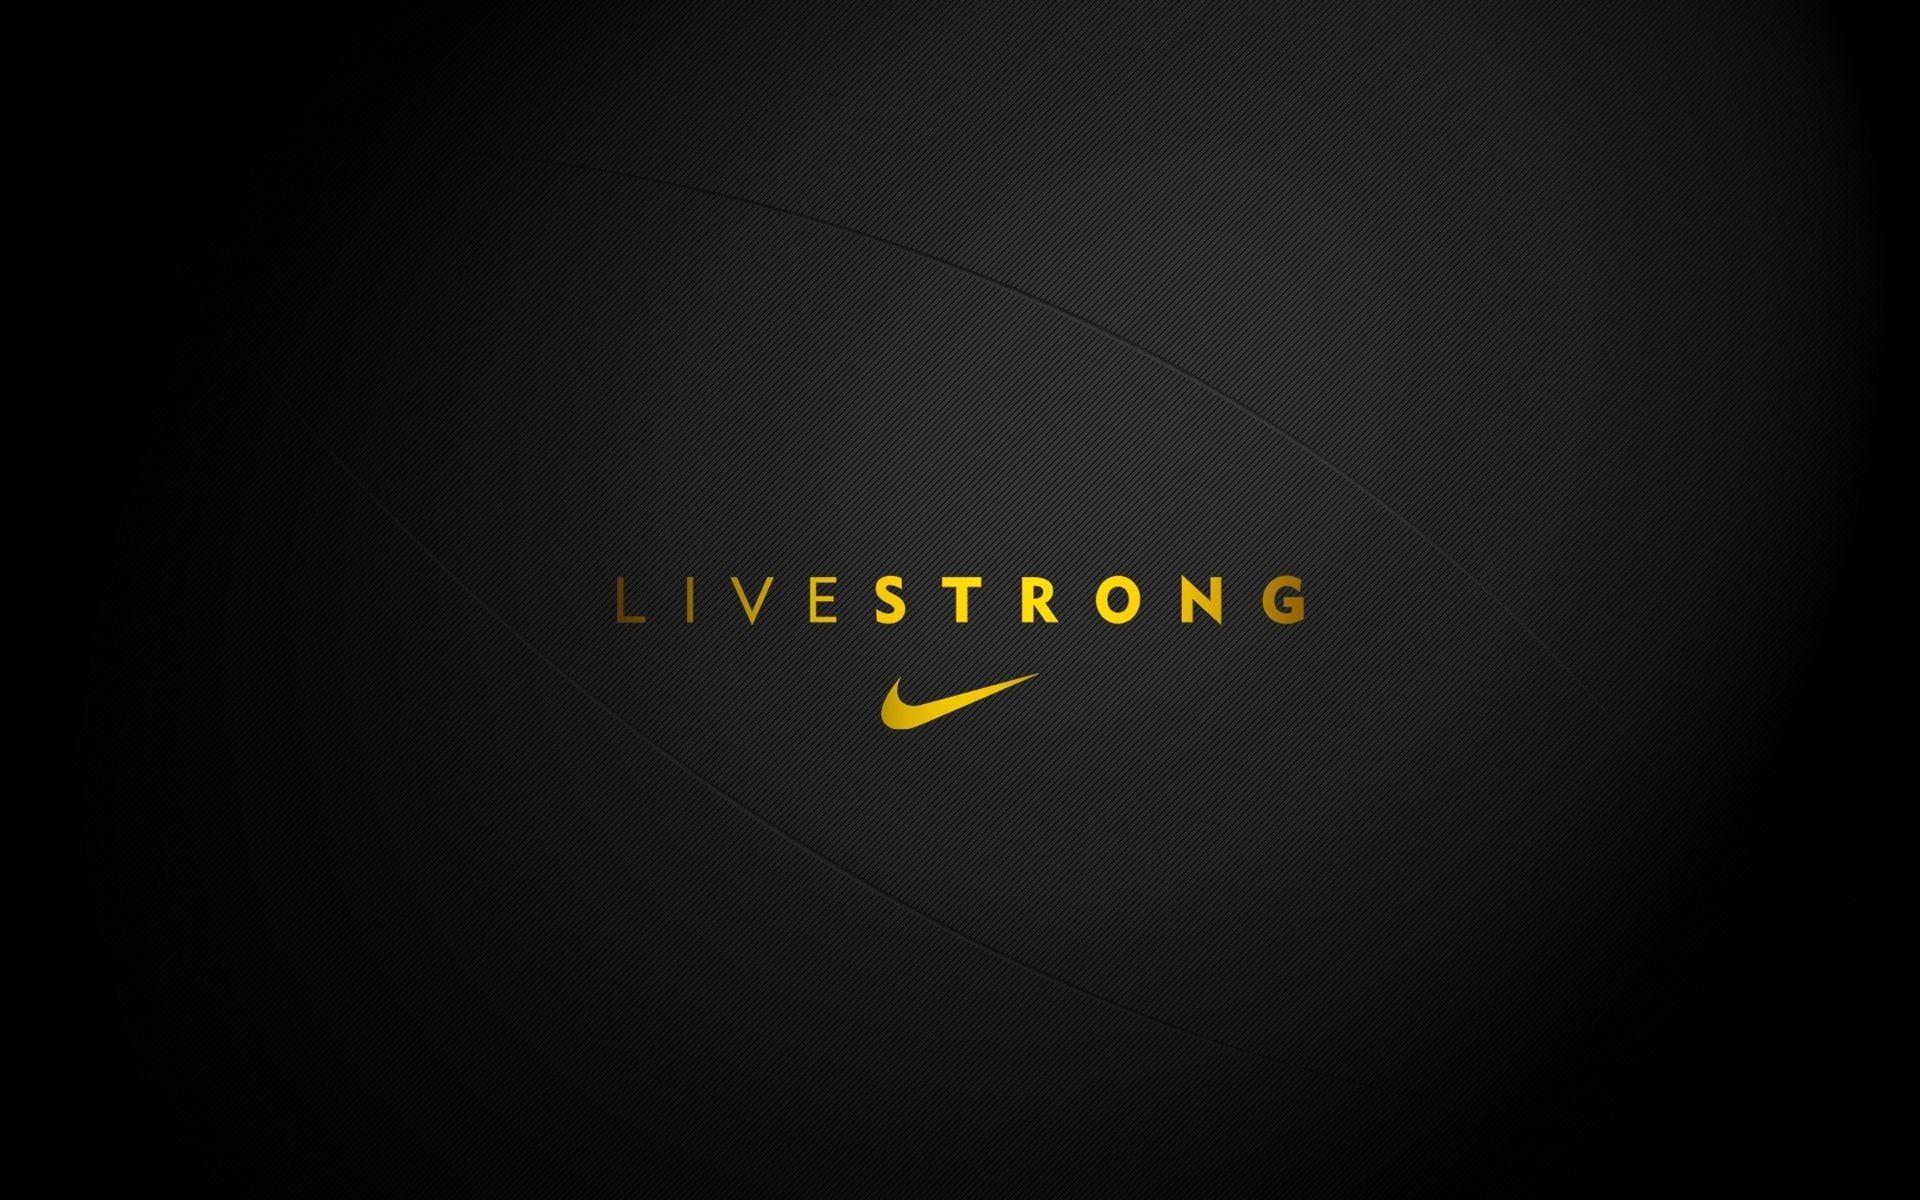 Nike Logo Wallpaper Free Download Best Games Wallpapers